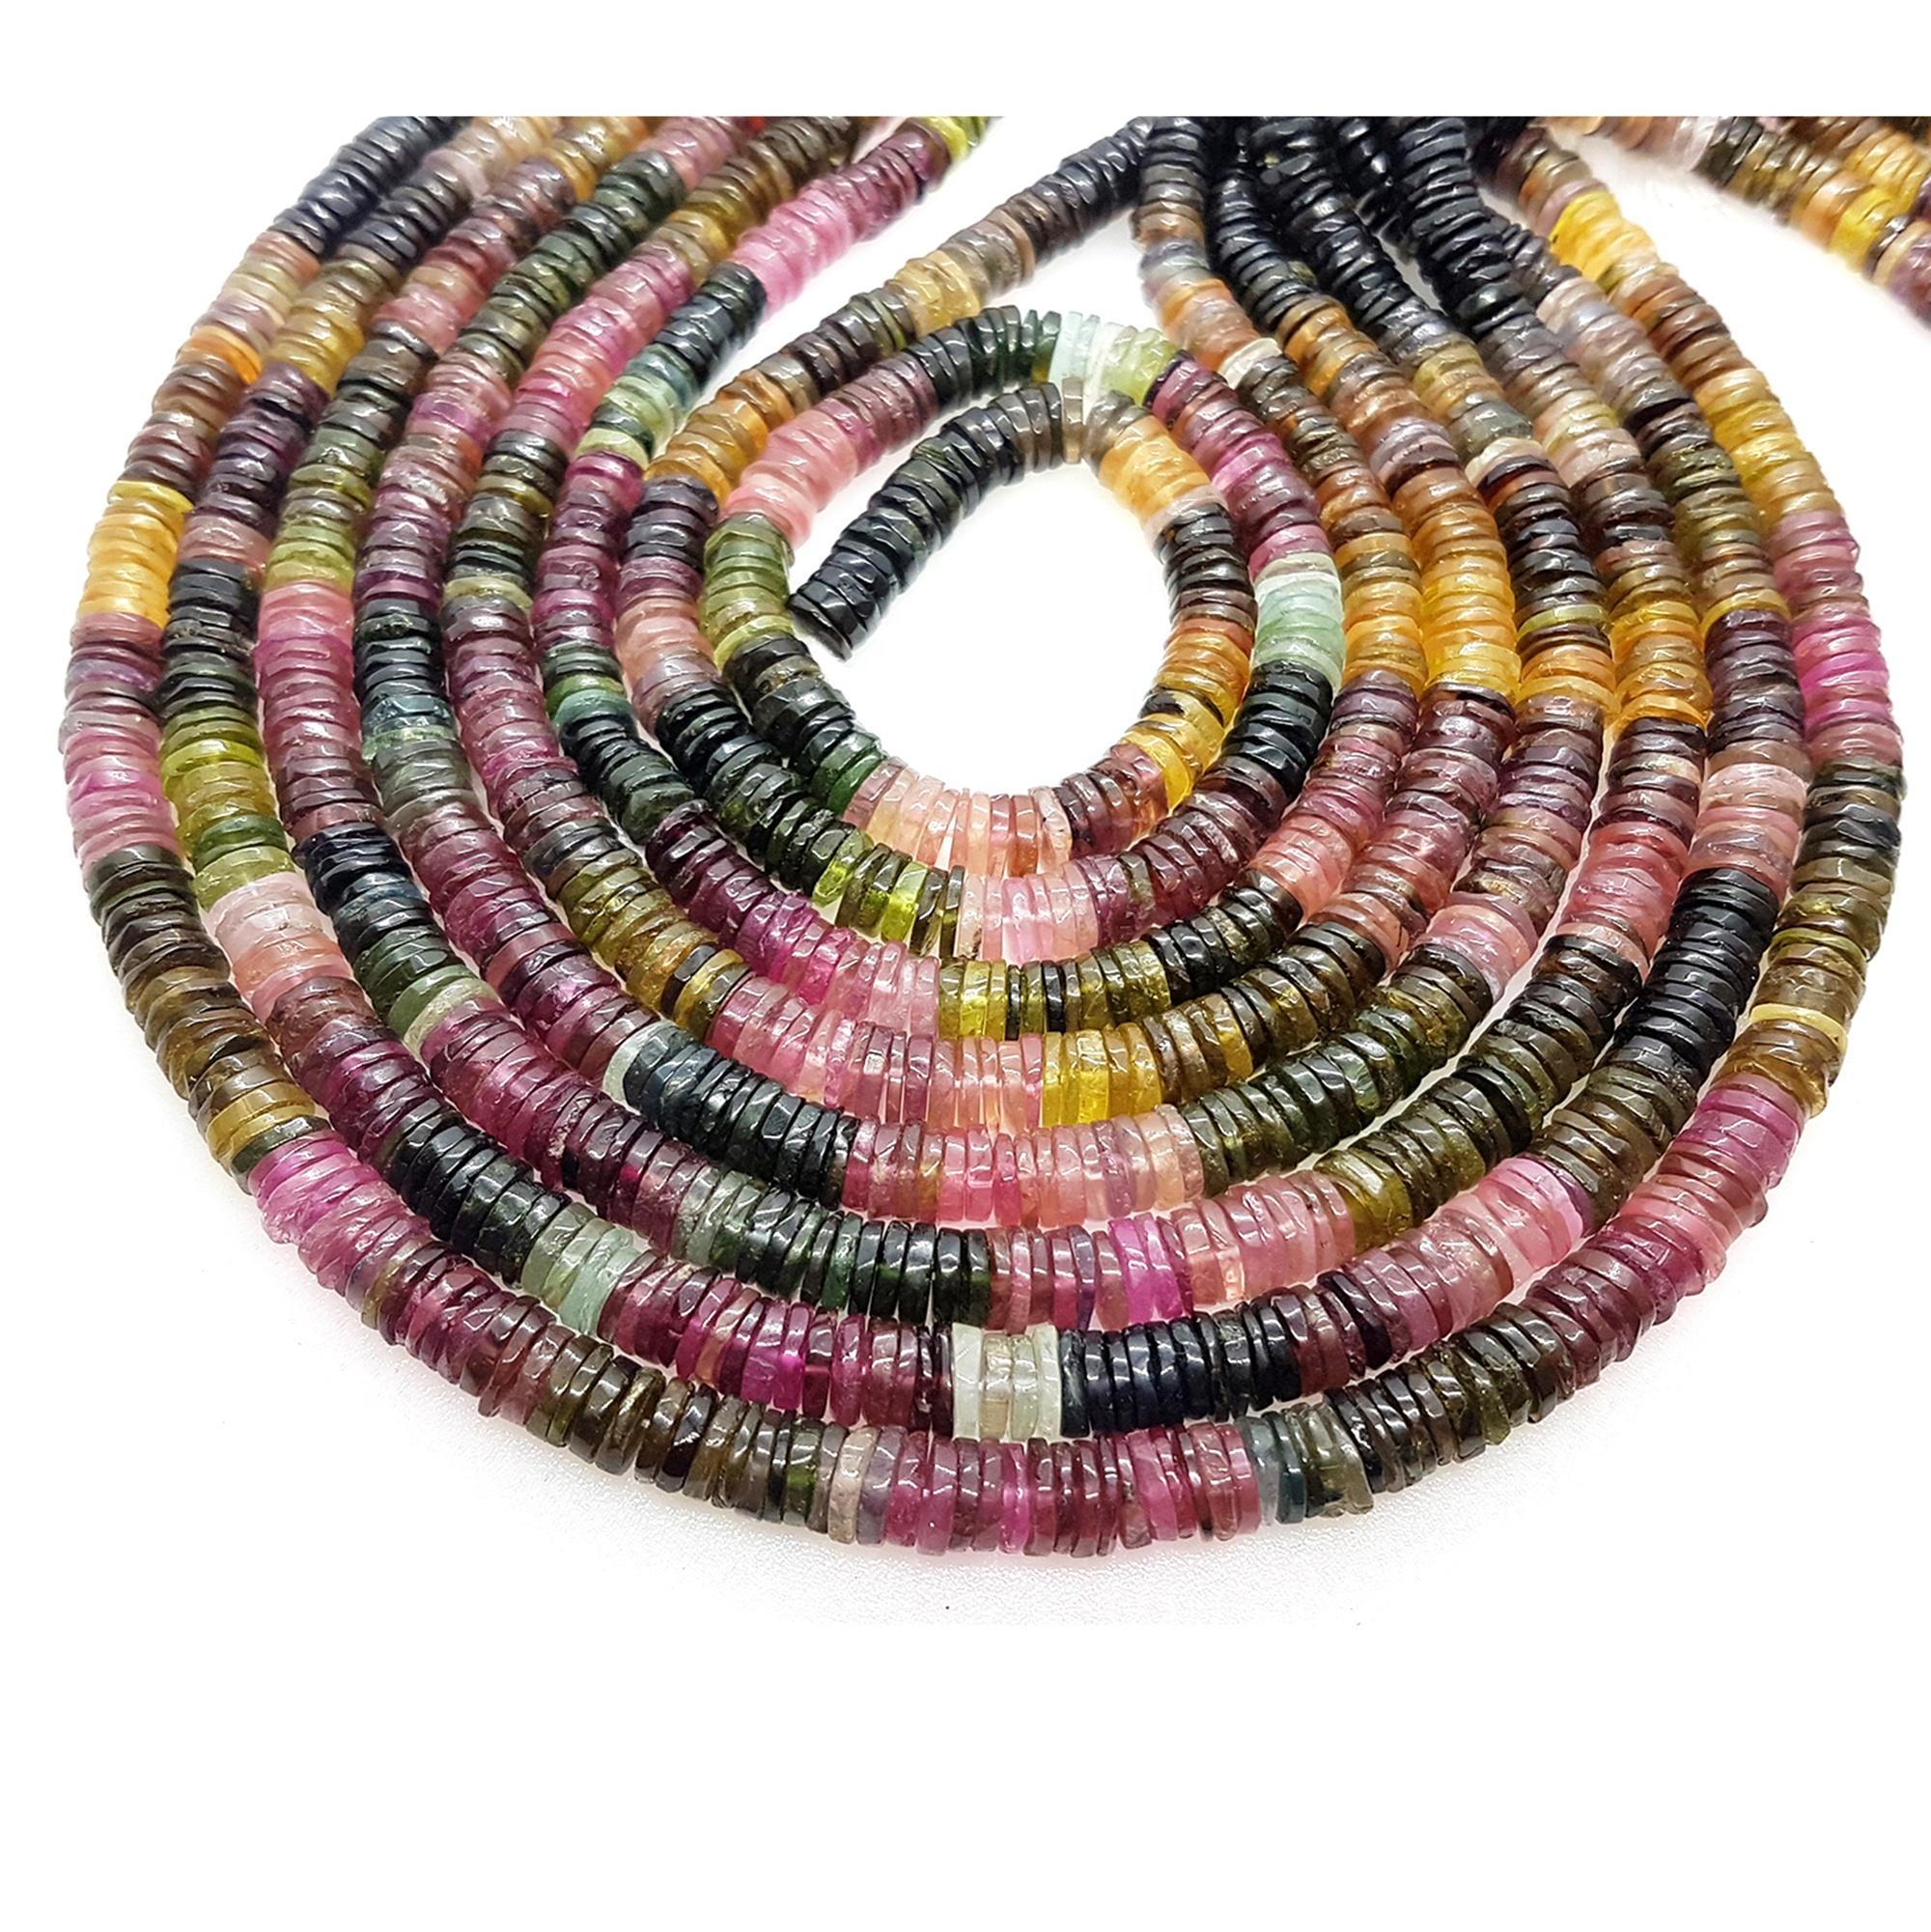 Natural Multi Tourmaline Plain Heishi Wholesale Beads, Gemstone Beads Supplier, Necklace Making Colorful Gemstone